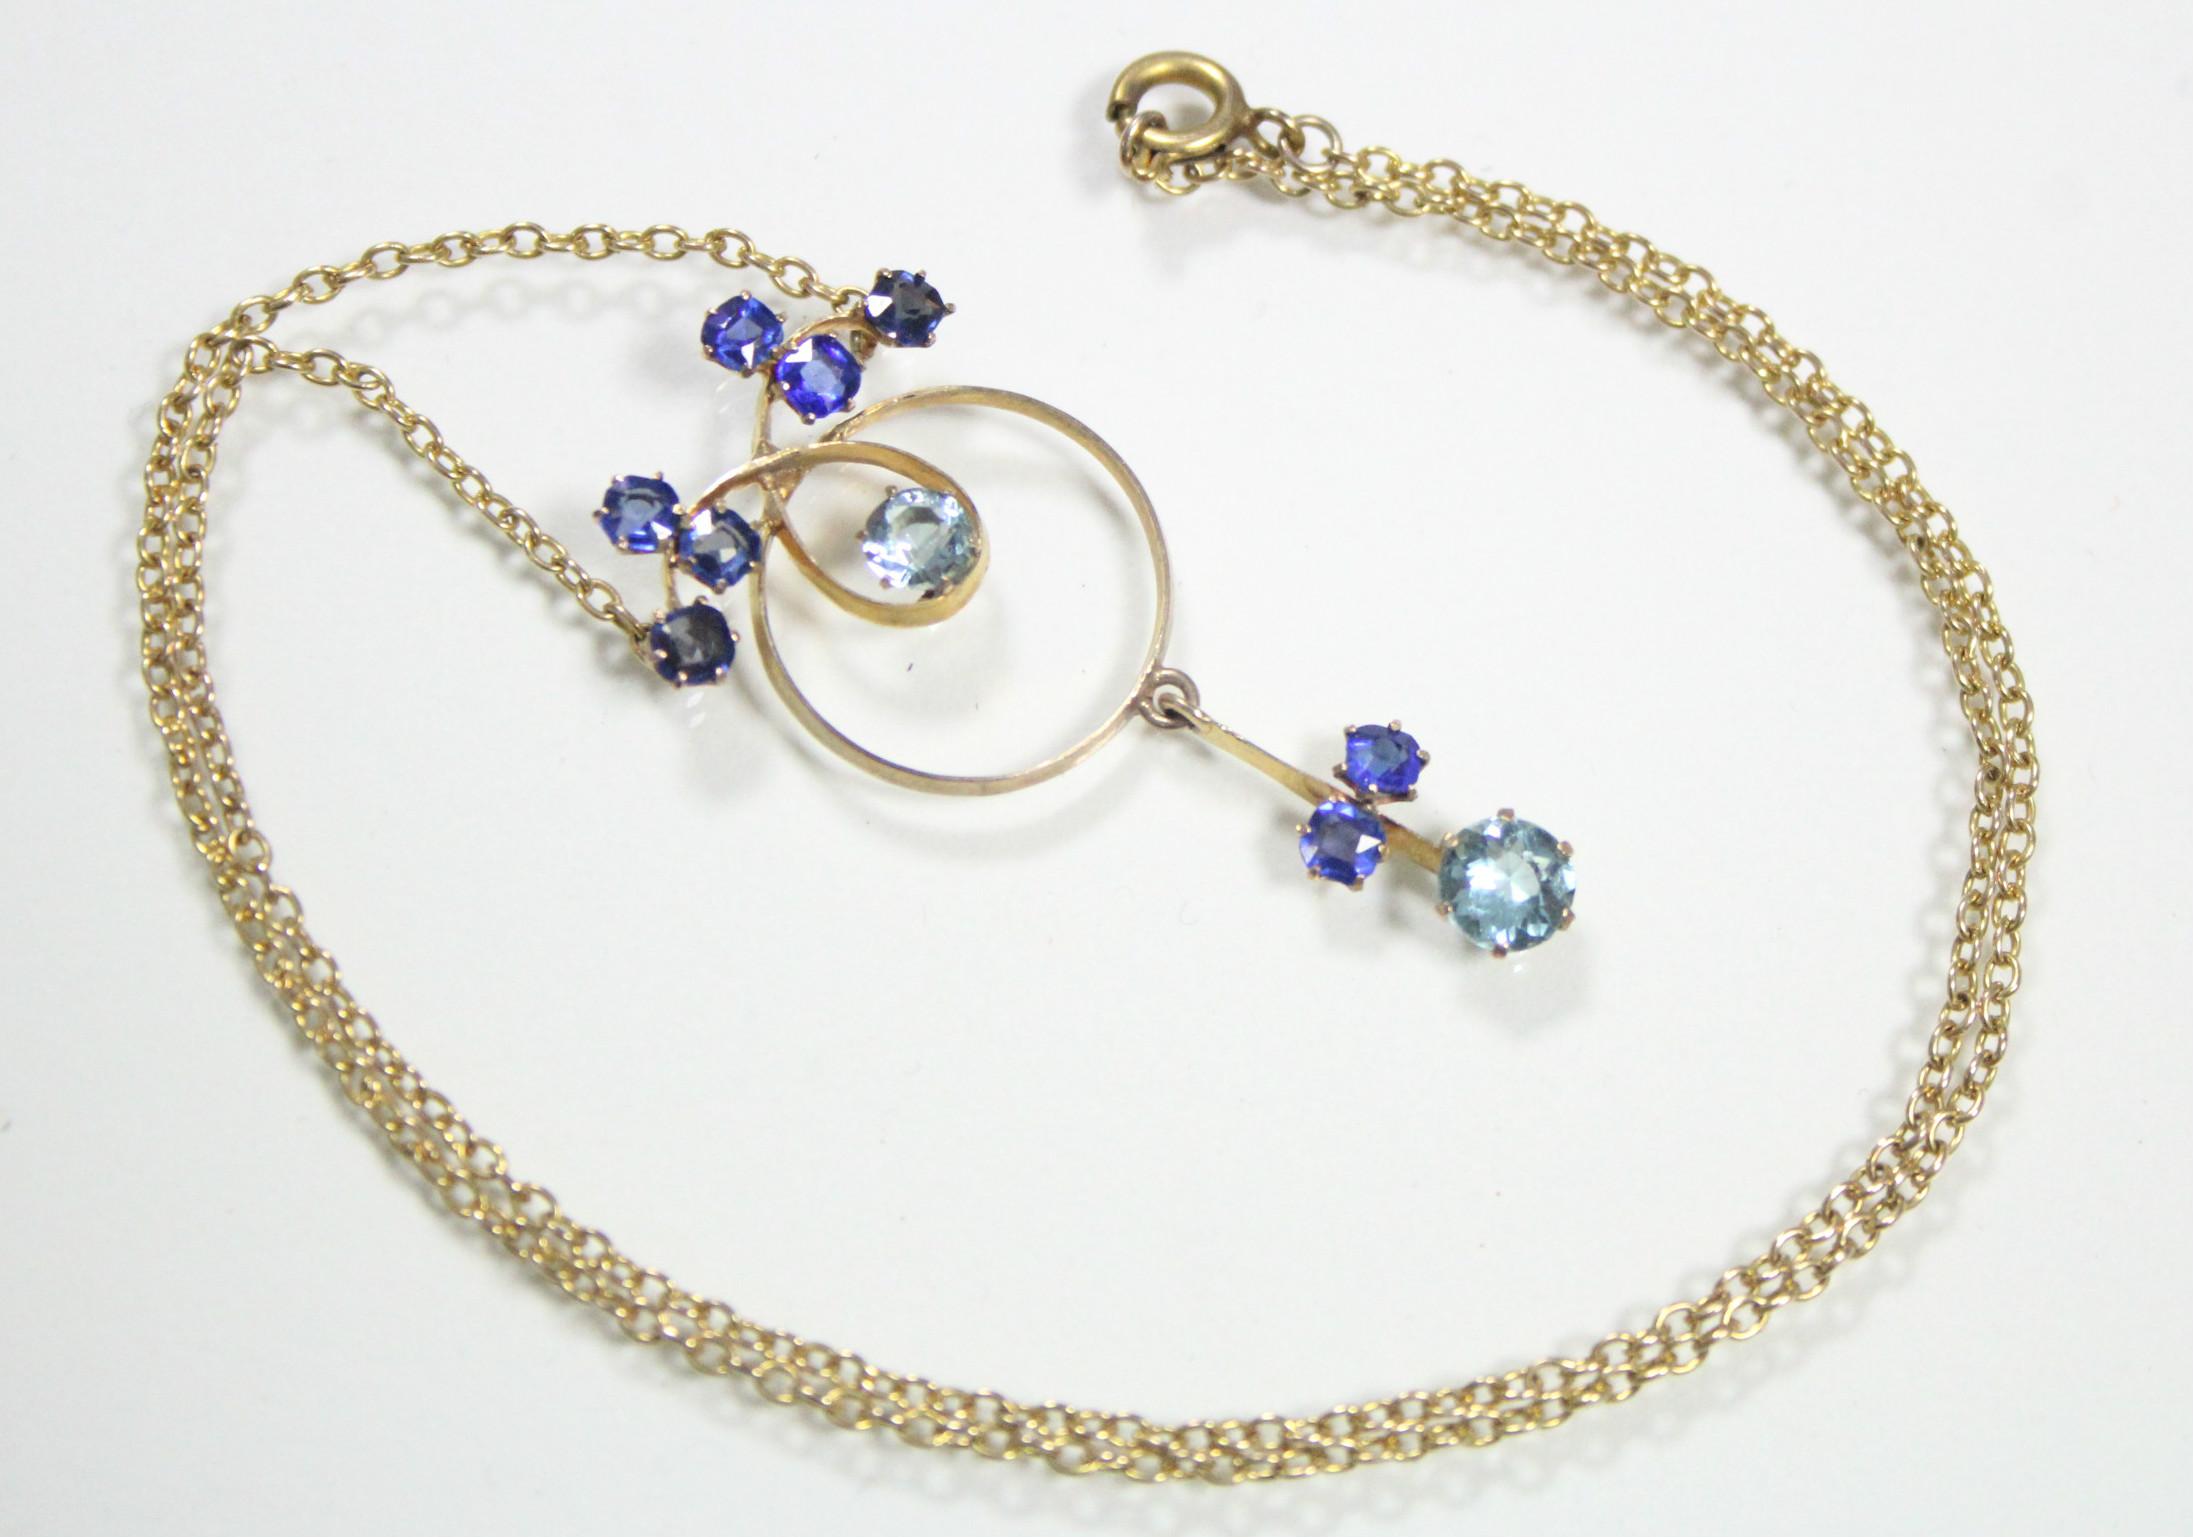 Lot 57 - A 9ct. gold circular openwork pendant set aquamarine & sapphires, pendant drop below, on fine-link